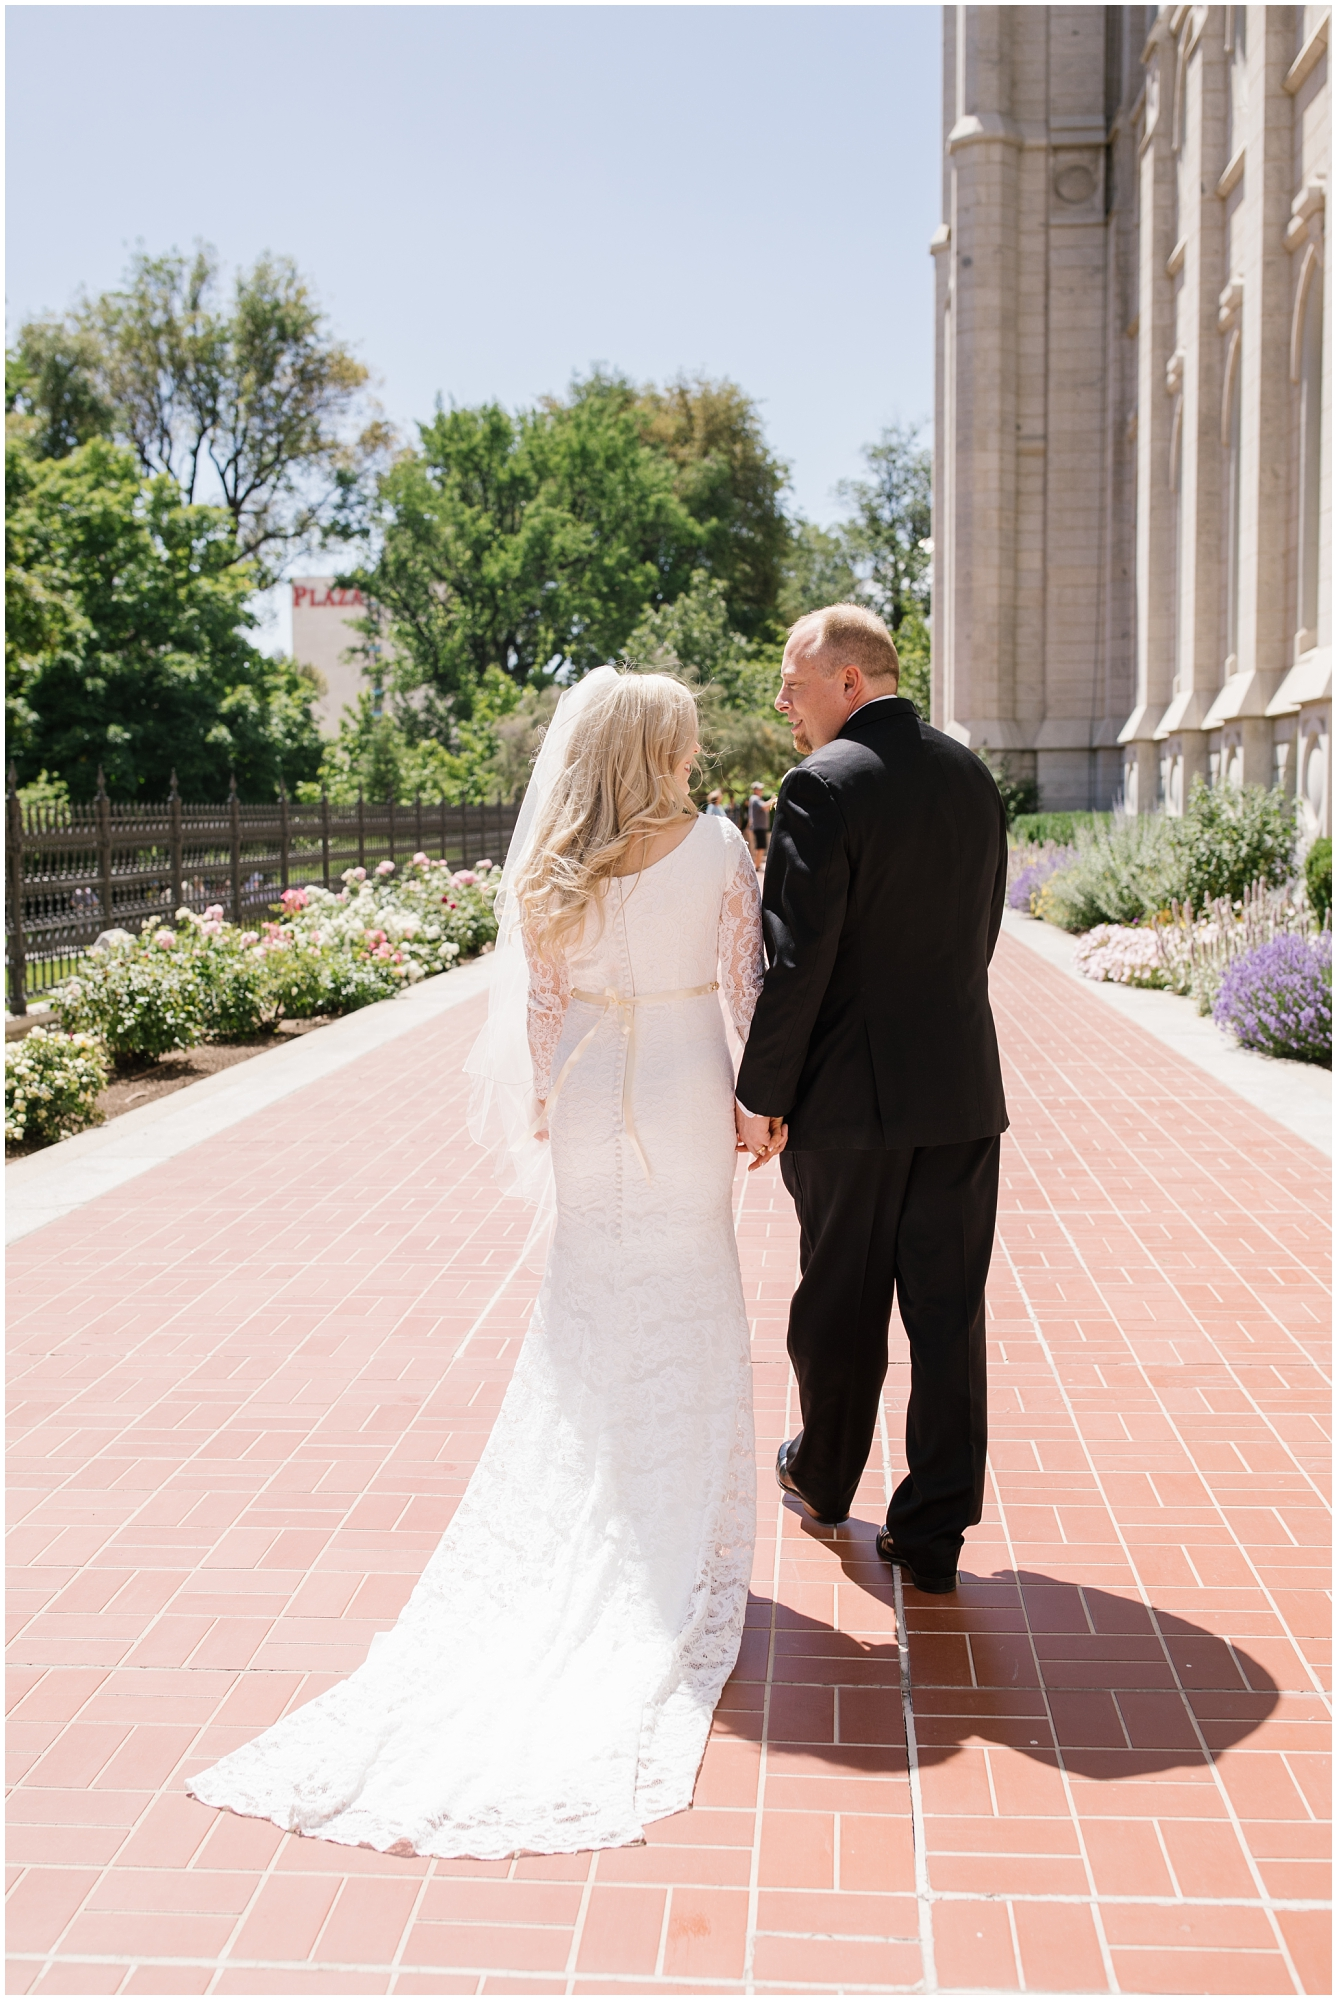 CherylandTyler-180_Lizzie-B-Imagery-Utah-Wedding-Photographer-Park-City-Salt-Lake-City-Temple-Wells-Fargo-Building.jpg